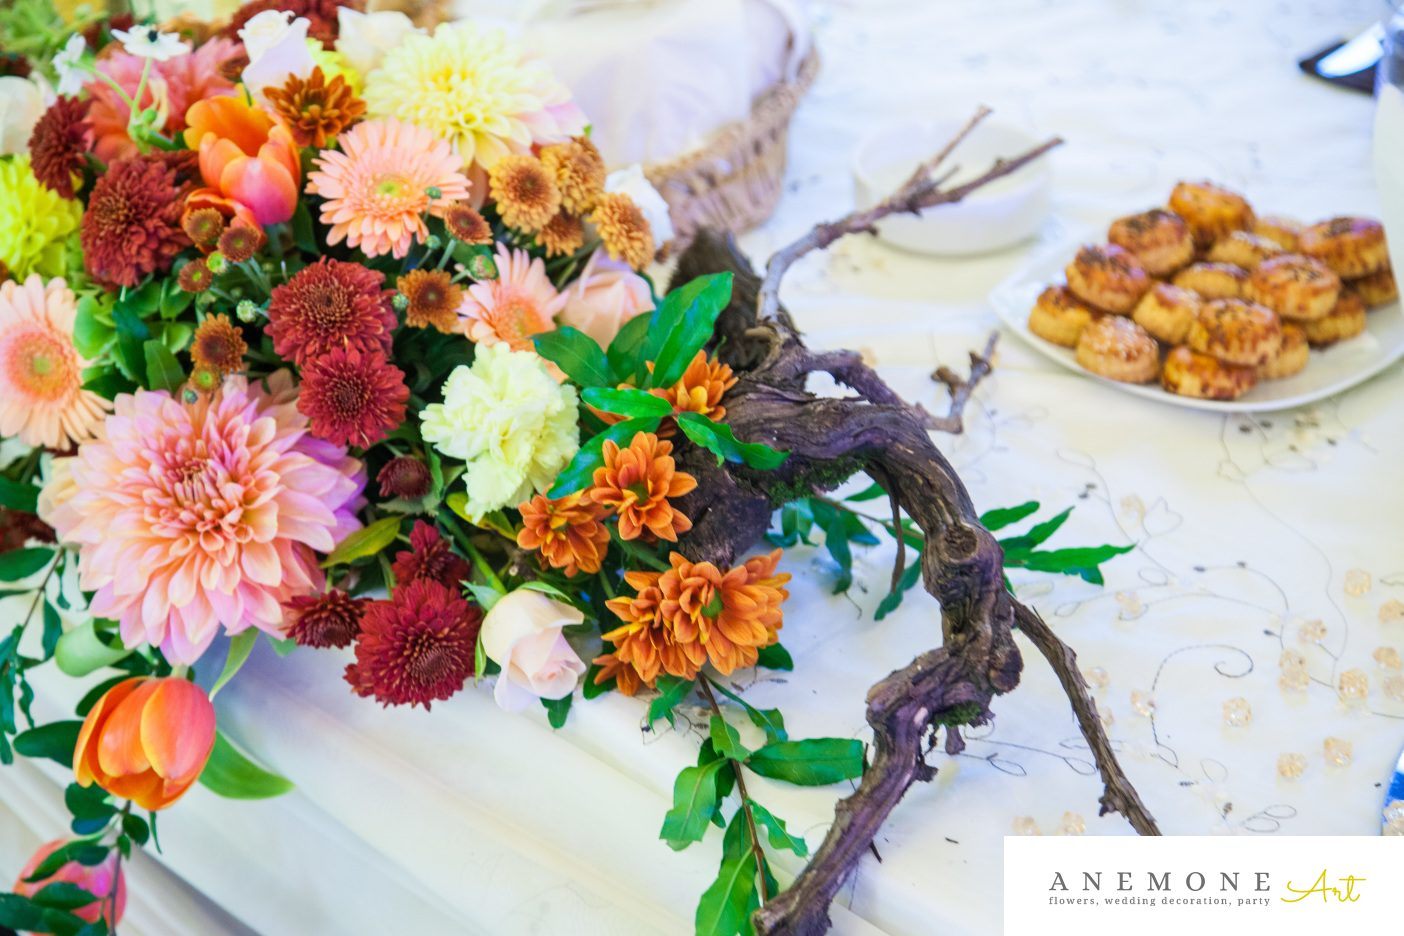 Poza, foto cu Flori de nunta caramiziu, crengi, portocaliu, prezidiu in Arad, Timisoara, Oradea (wedding flowers, bouquets) nunta Arad, Timisoara, Oradea